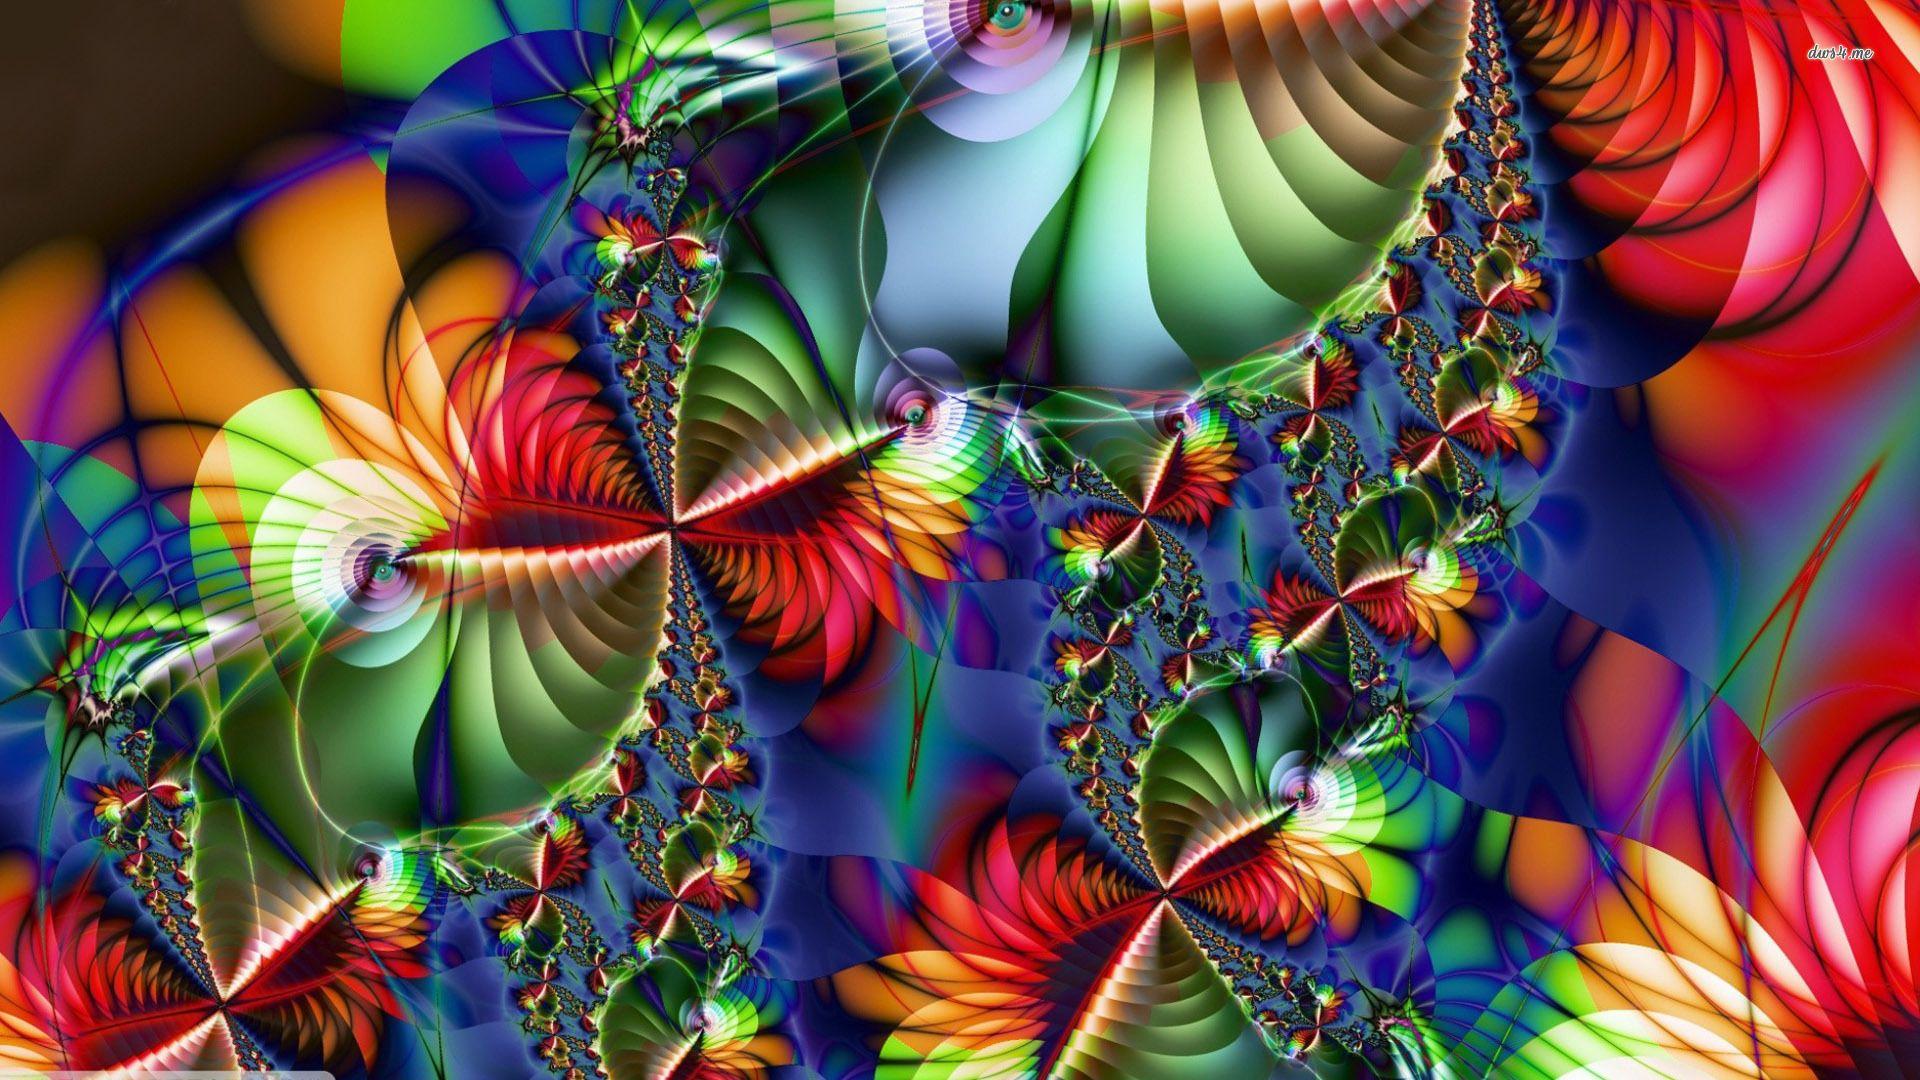 Kaleidoscope Pic